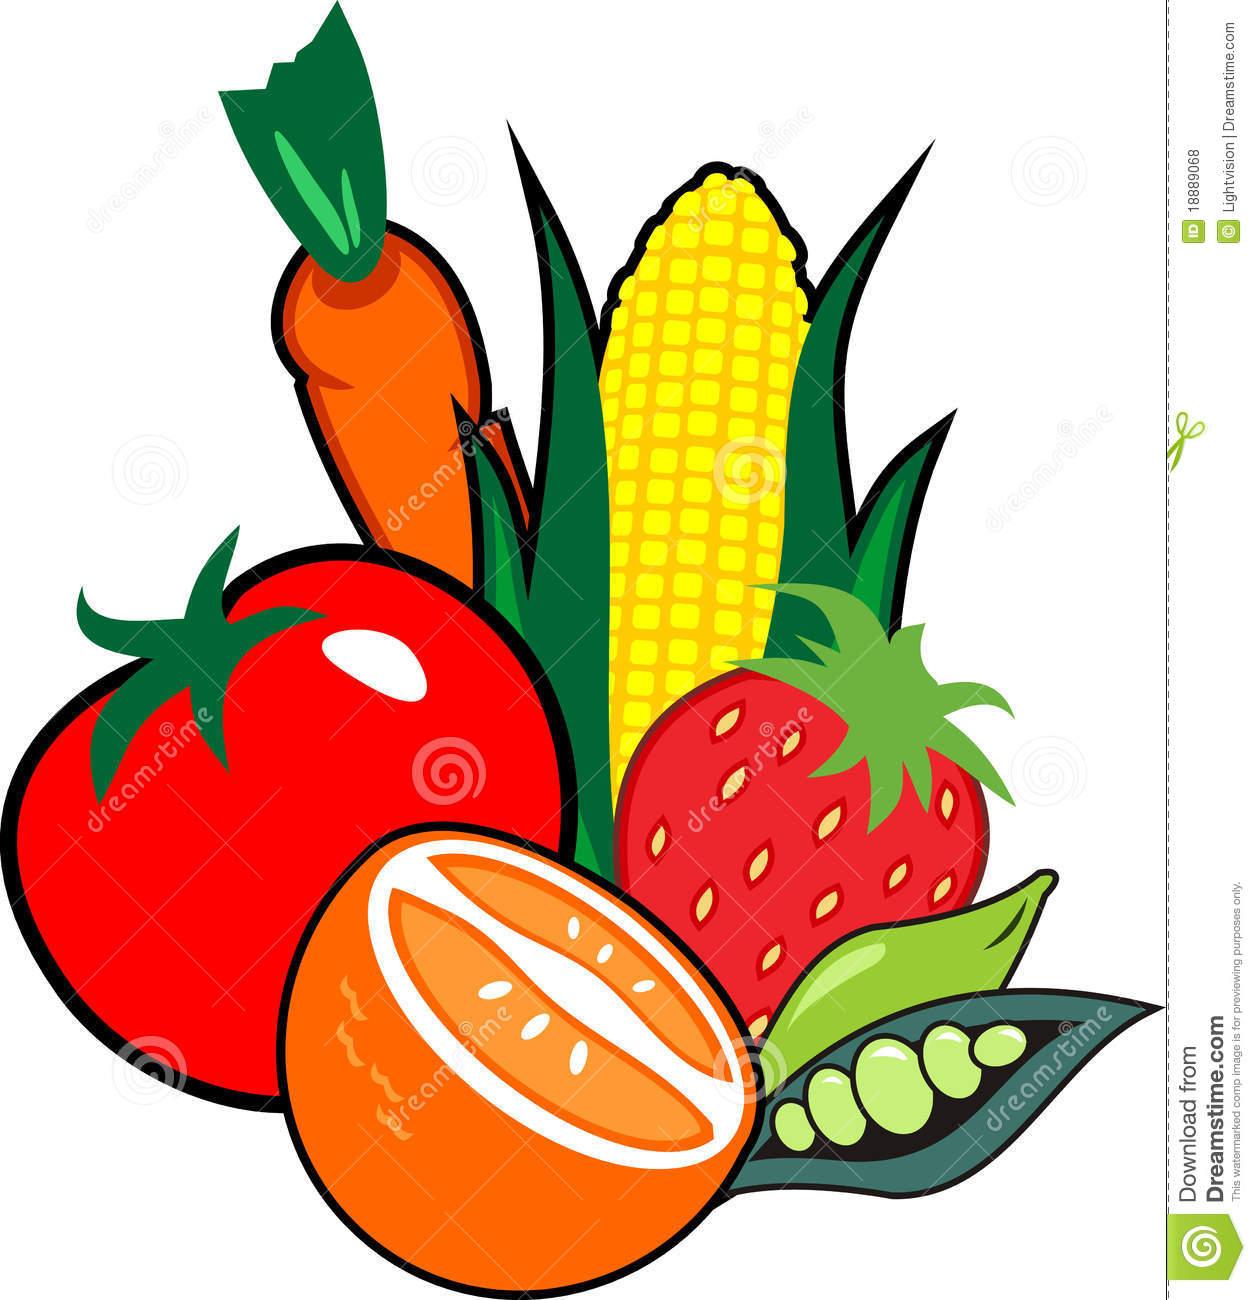 Vegetable Clipart & Vegetable Clip Art Images.